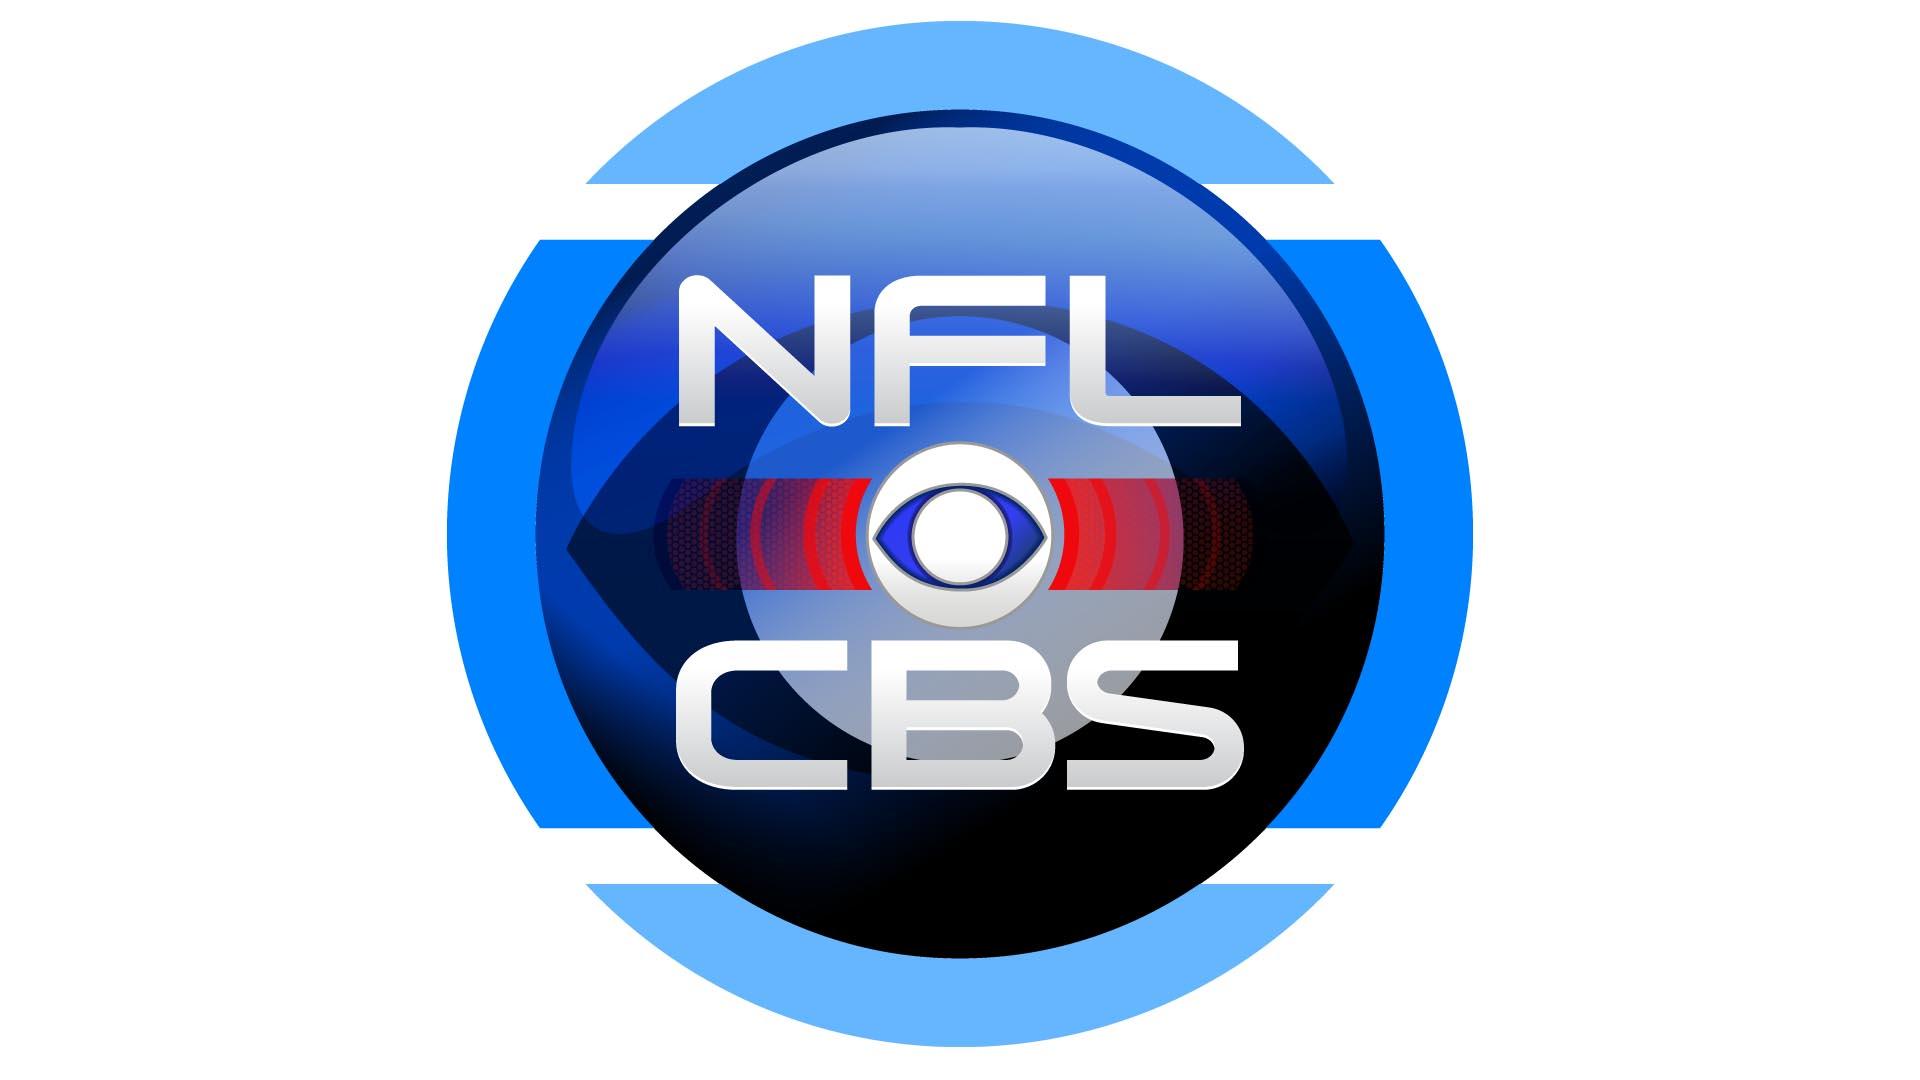 NFL on CBS NFL Nfl on cbs, Cbs sports, Nfl